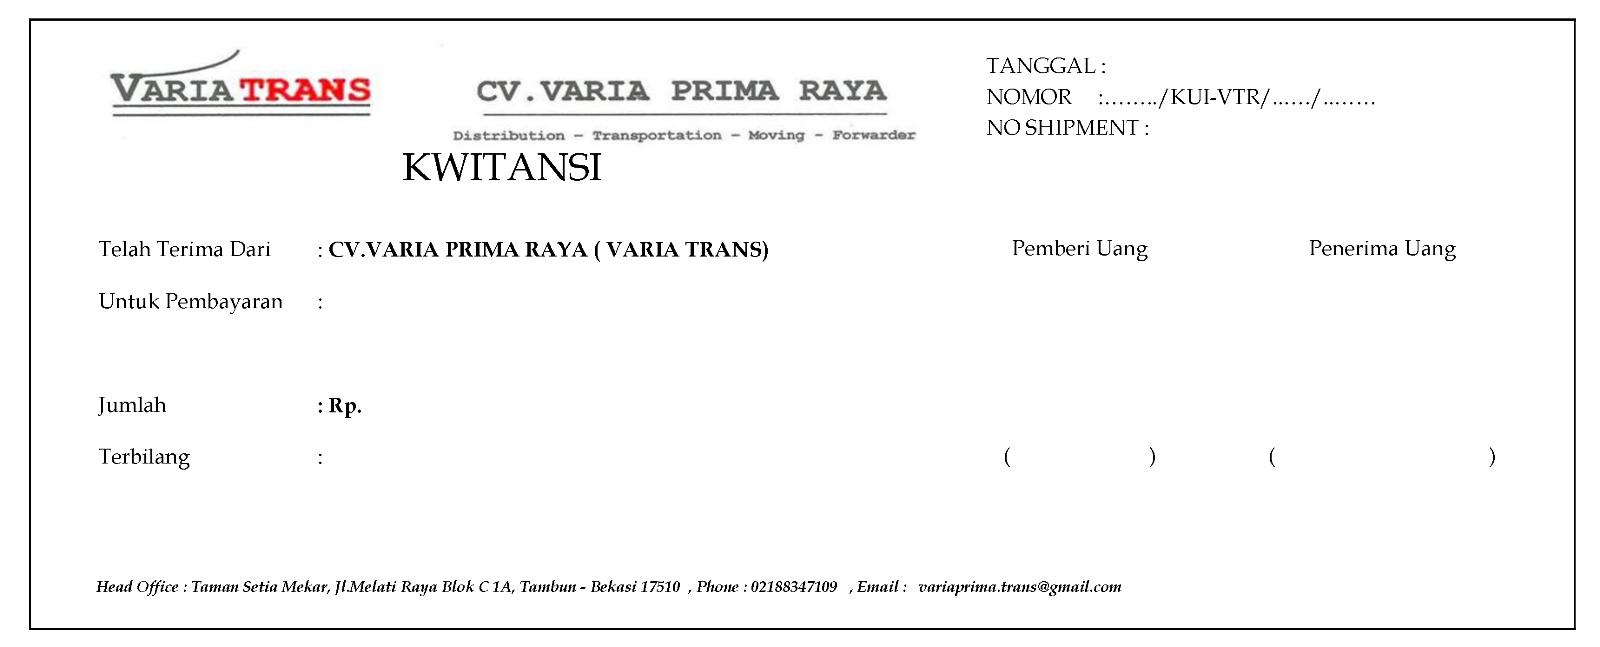 Contoh Invoice Jasa Service Apotek D